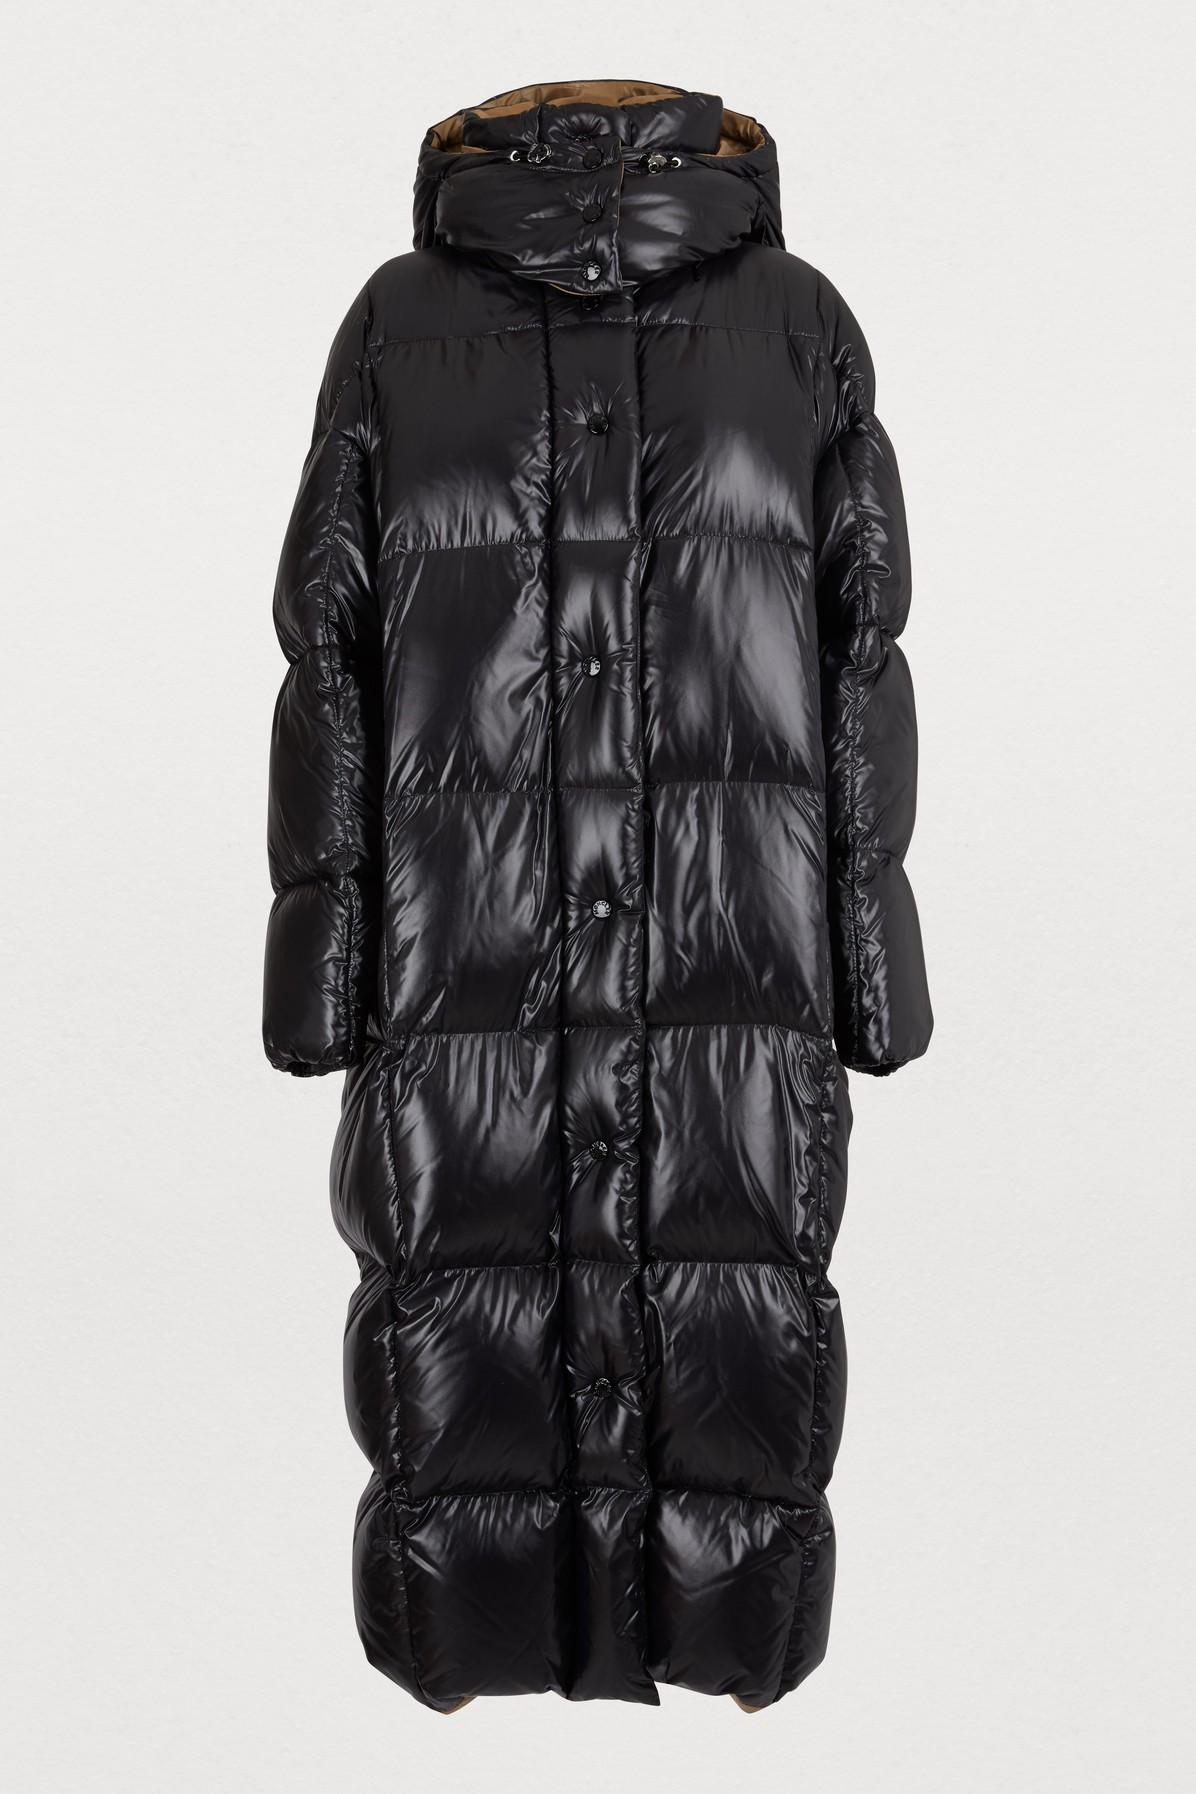 1527ffc51 Parnaiba Long Down Jacket in Black